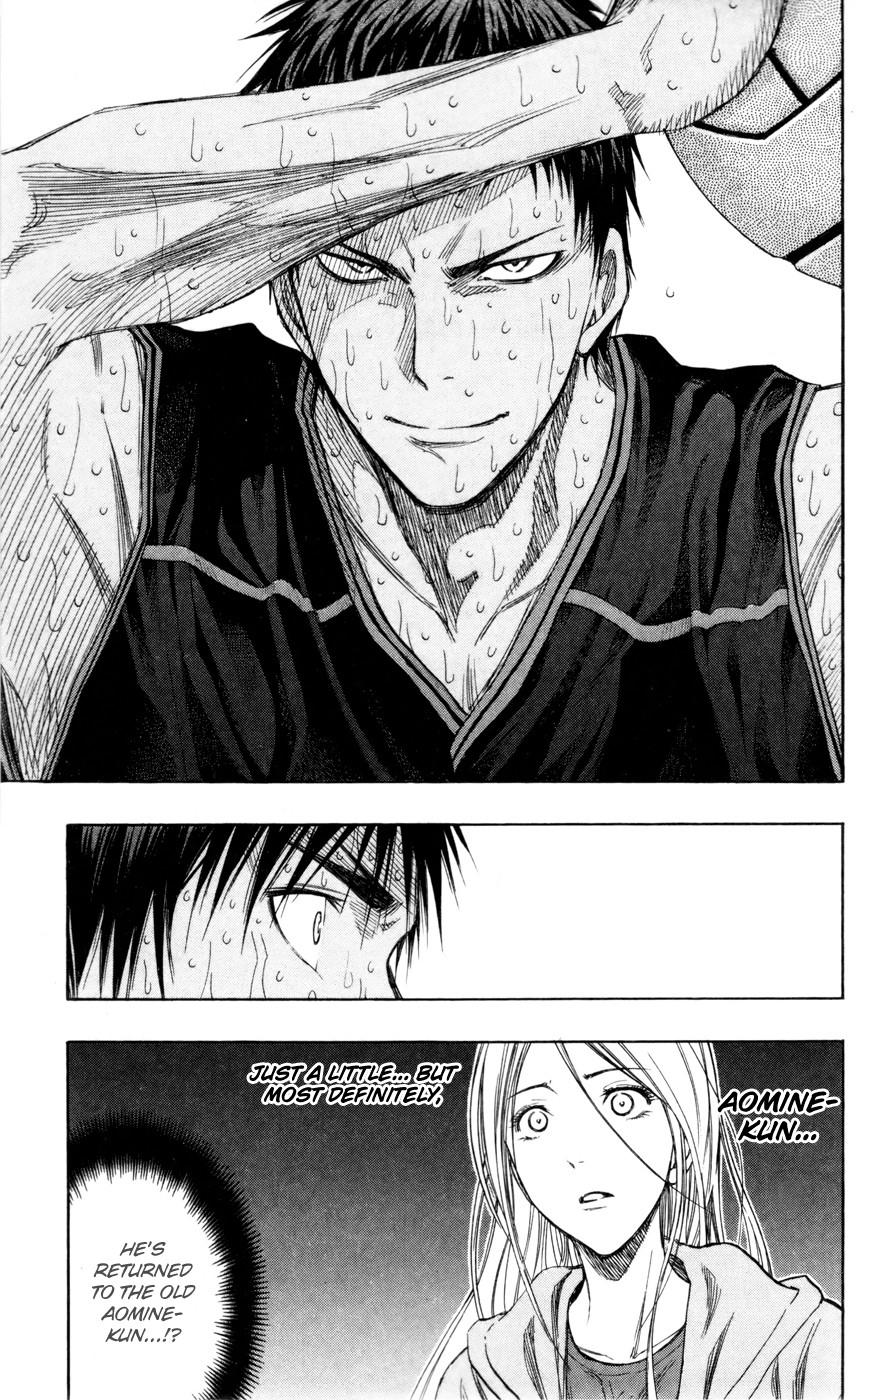 Kuroko no Basket Manga Chapter 130 - Image 18